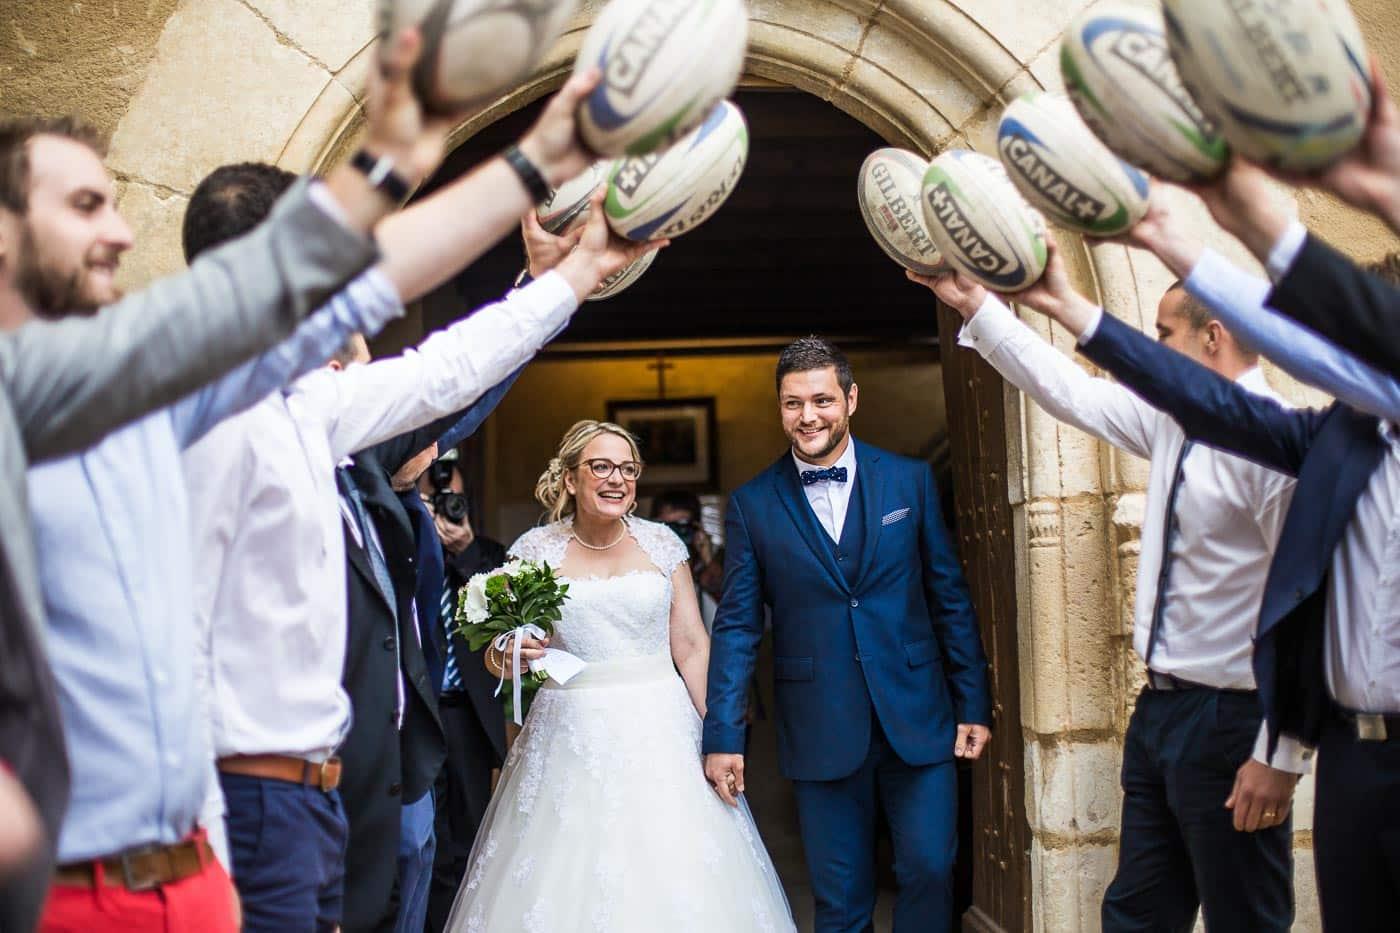 raphai-bernus-photos-de-mariage-4